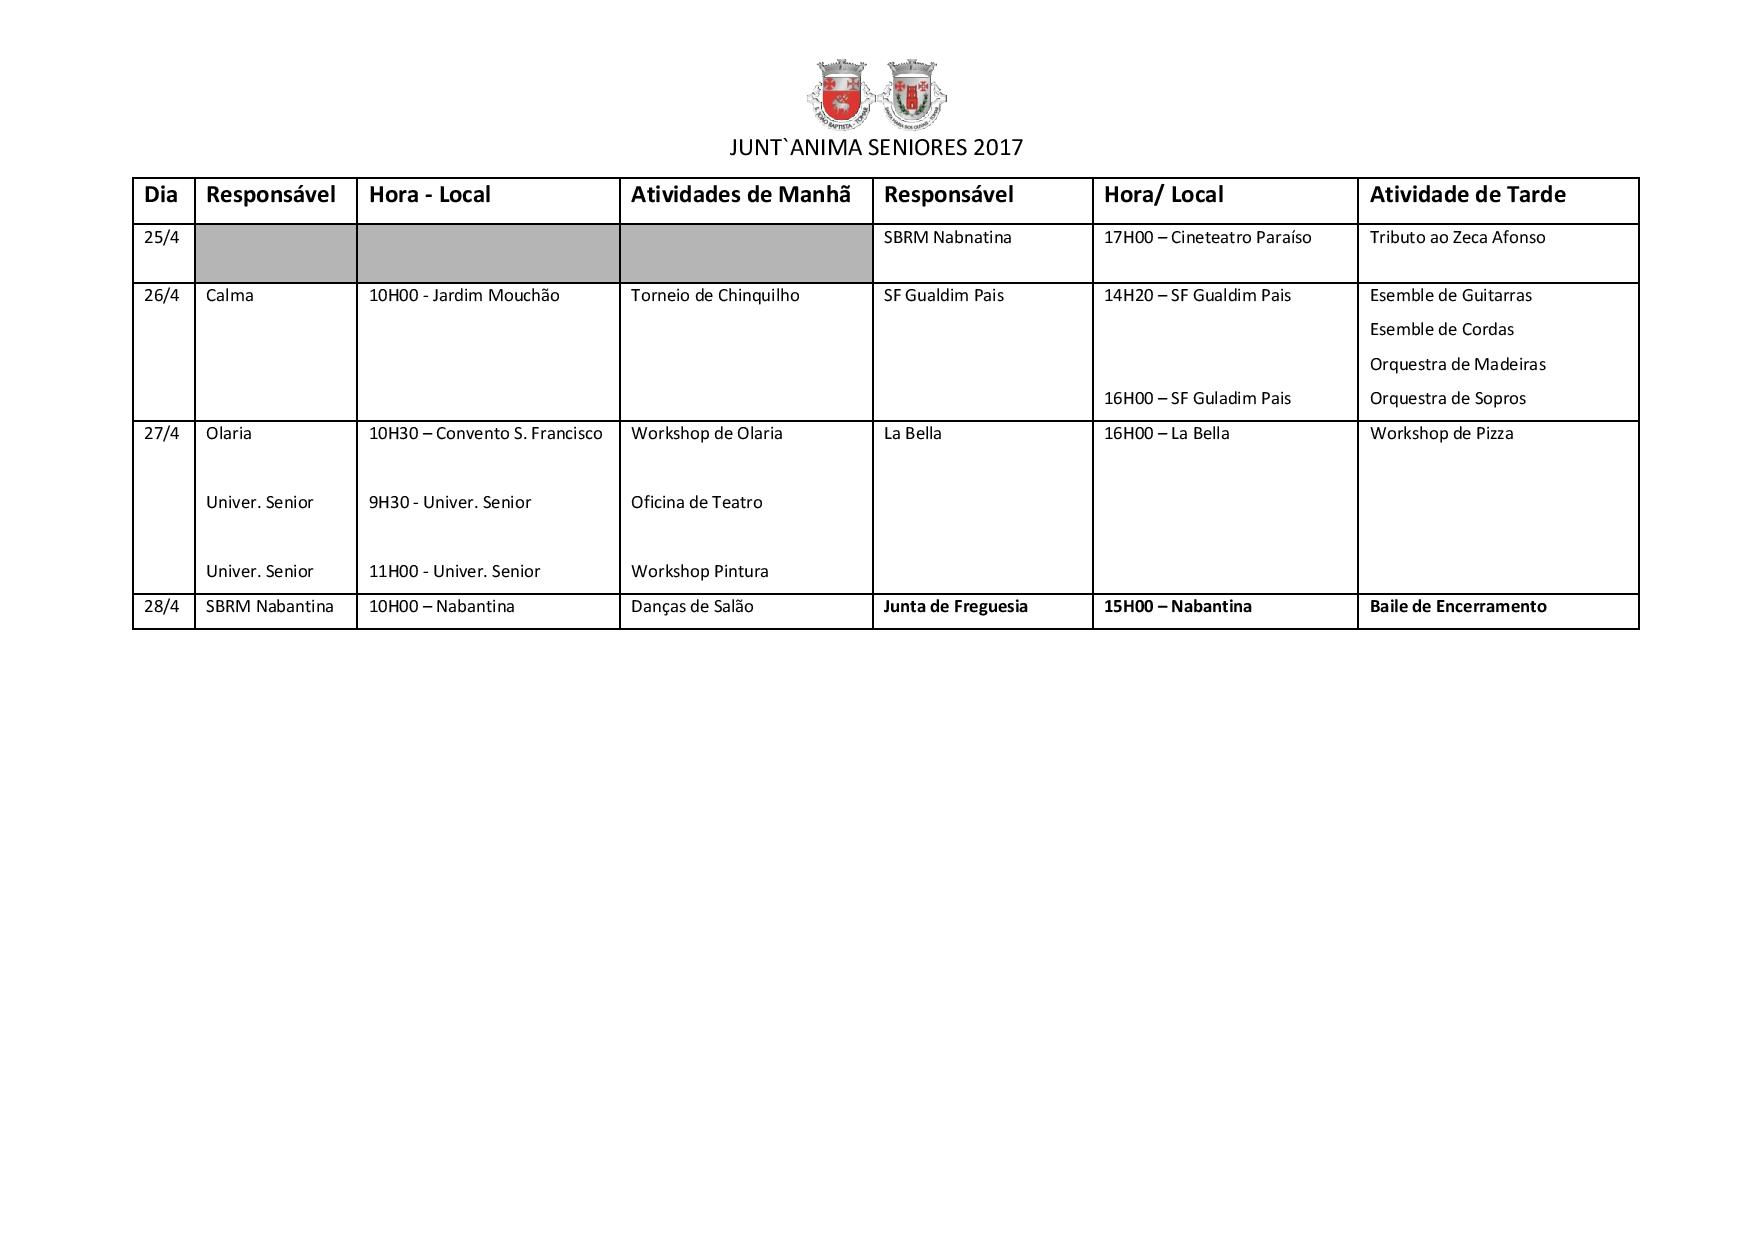 tabela de atividades seniores - parceiros-page-002